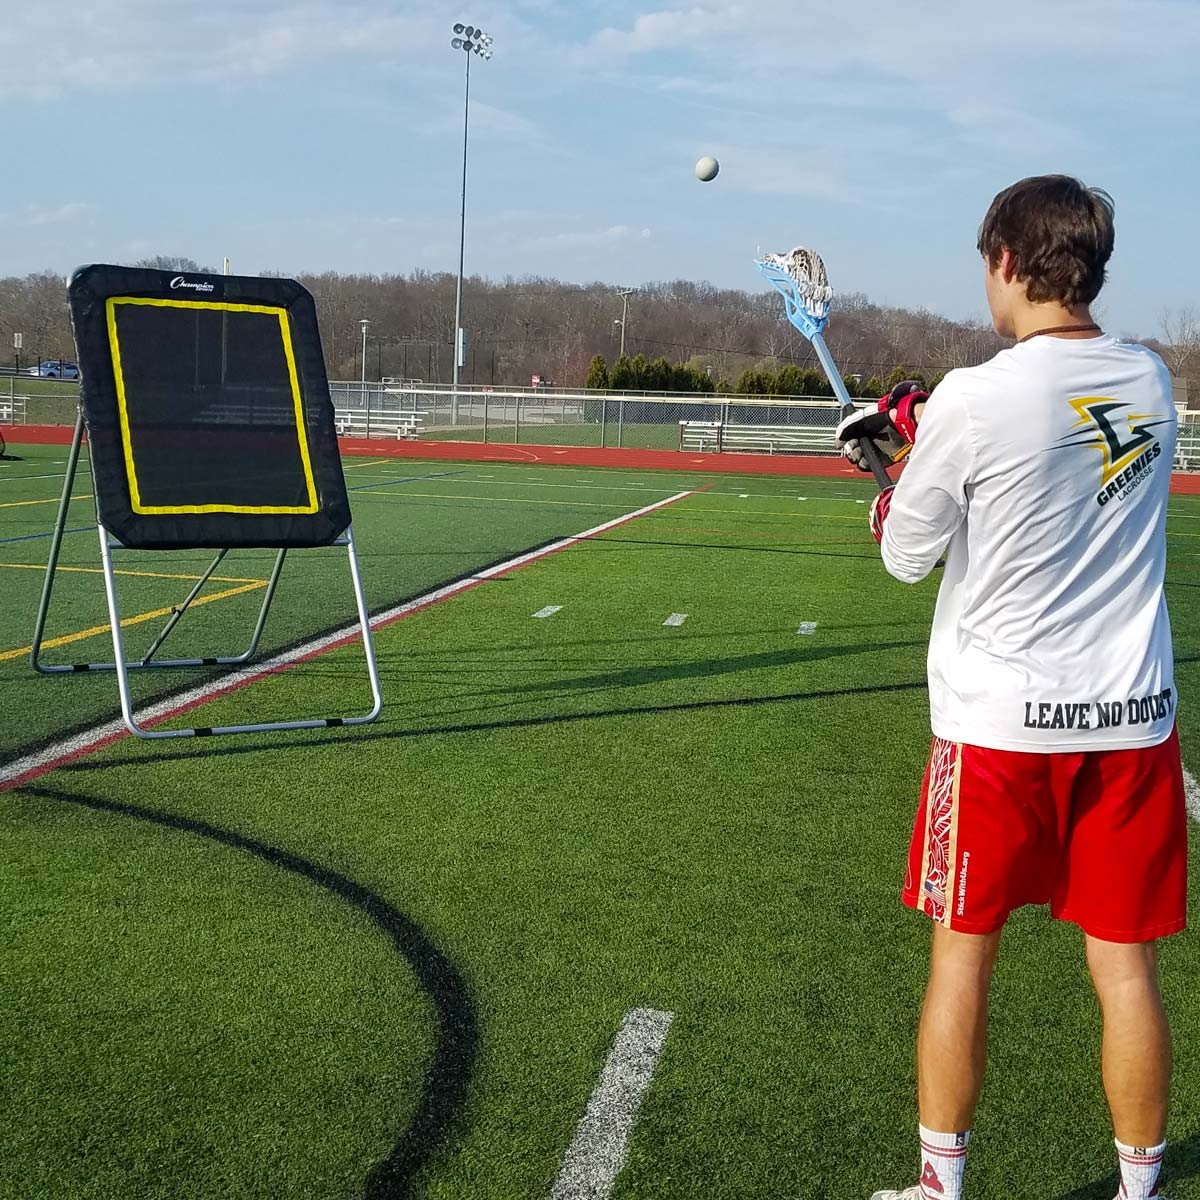 Champion Pro Bounce Back Lacrosse Target Lbt43 A63 341